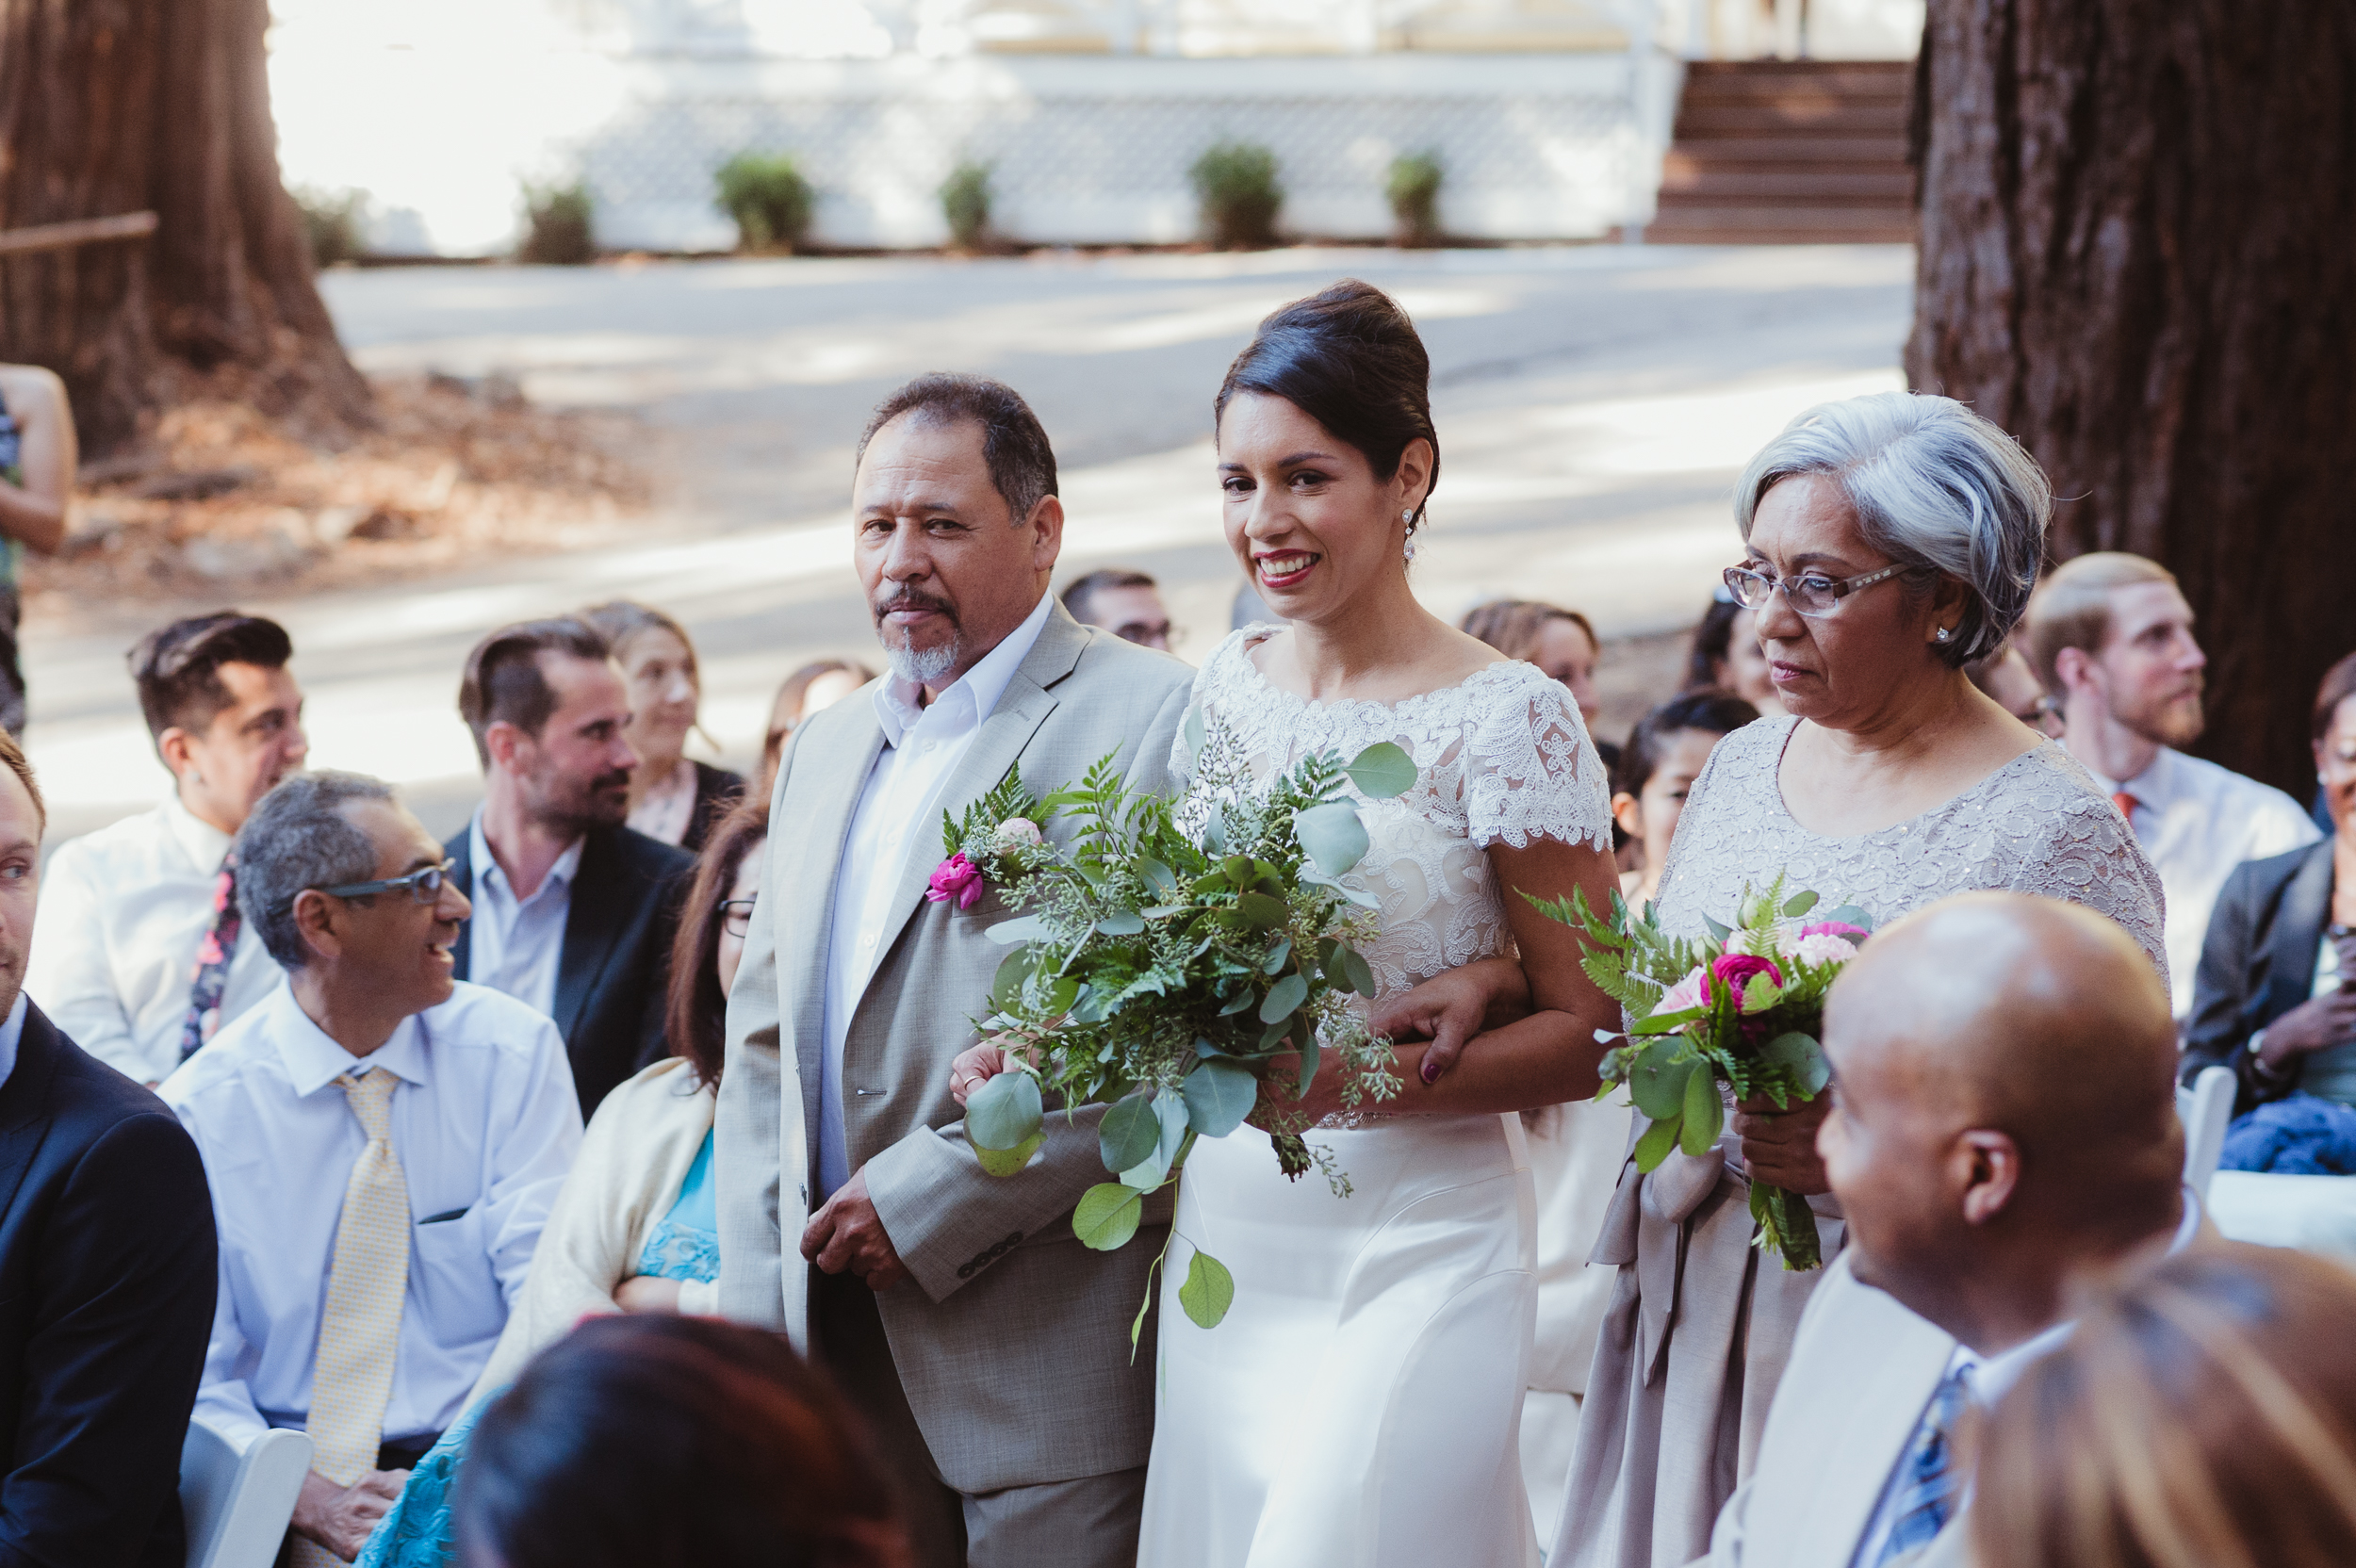 27san-francisco-stern-grove-wedding-photographer-vivianchen-205.jpg